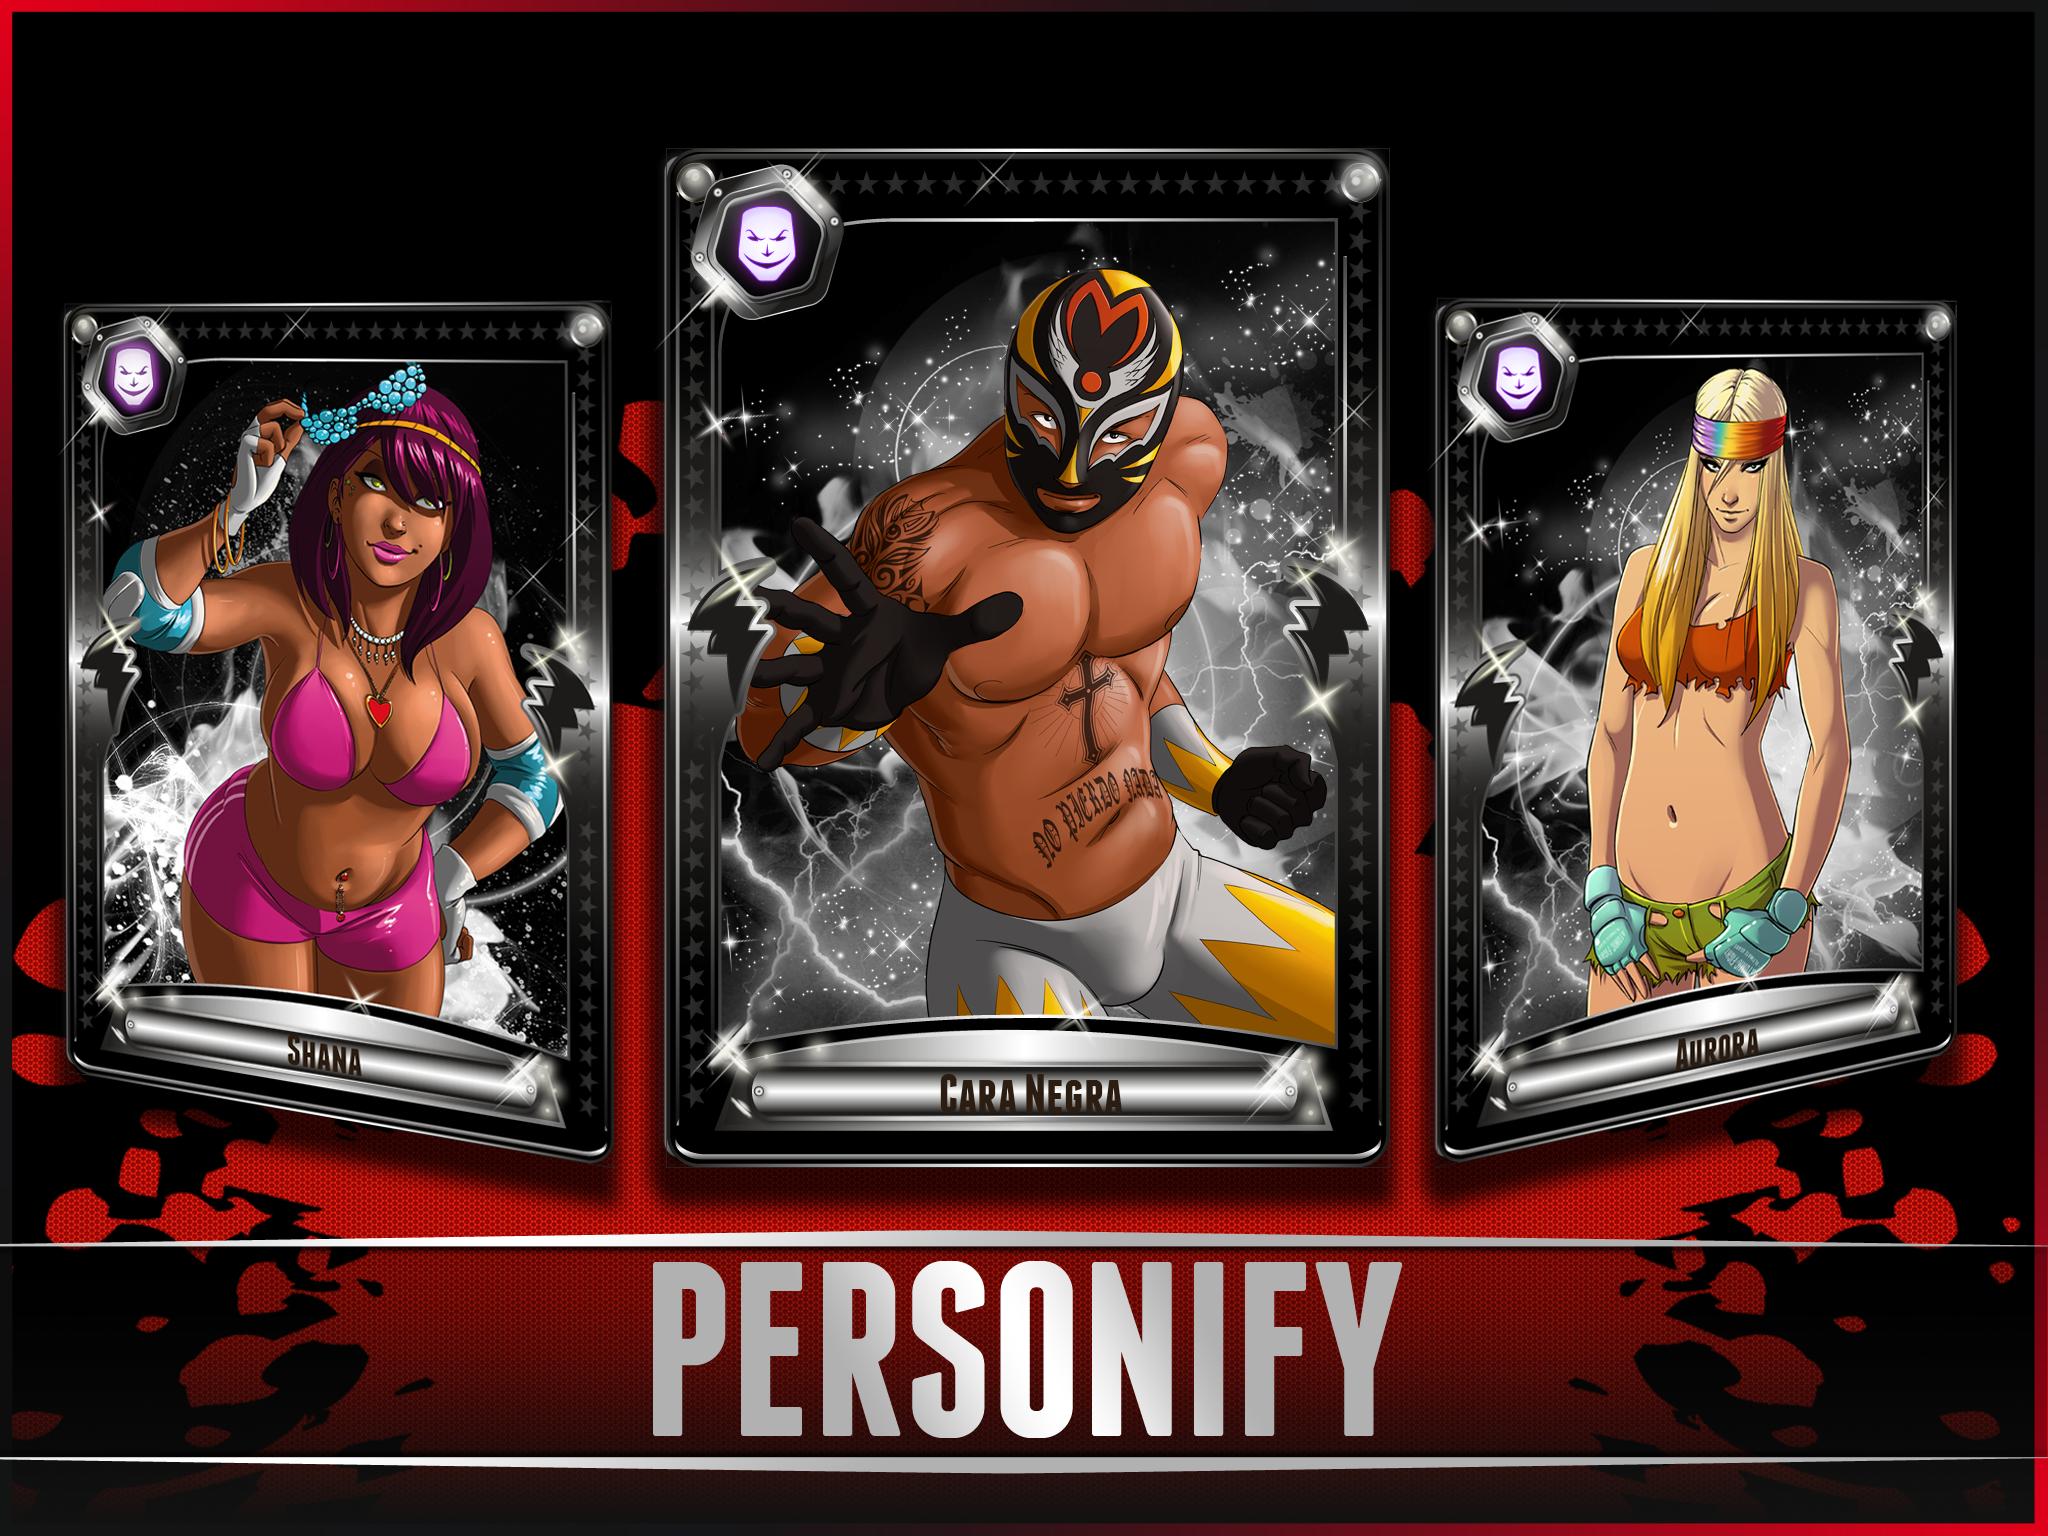 http://img.appular.com.s3.amazonaws.com/Wrestling%20Storm%20Screenshots/Wrestling%20Storm%20Screenshot%205.png